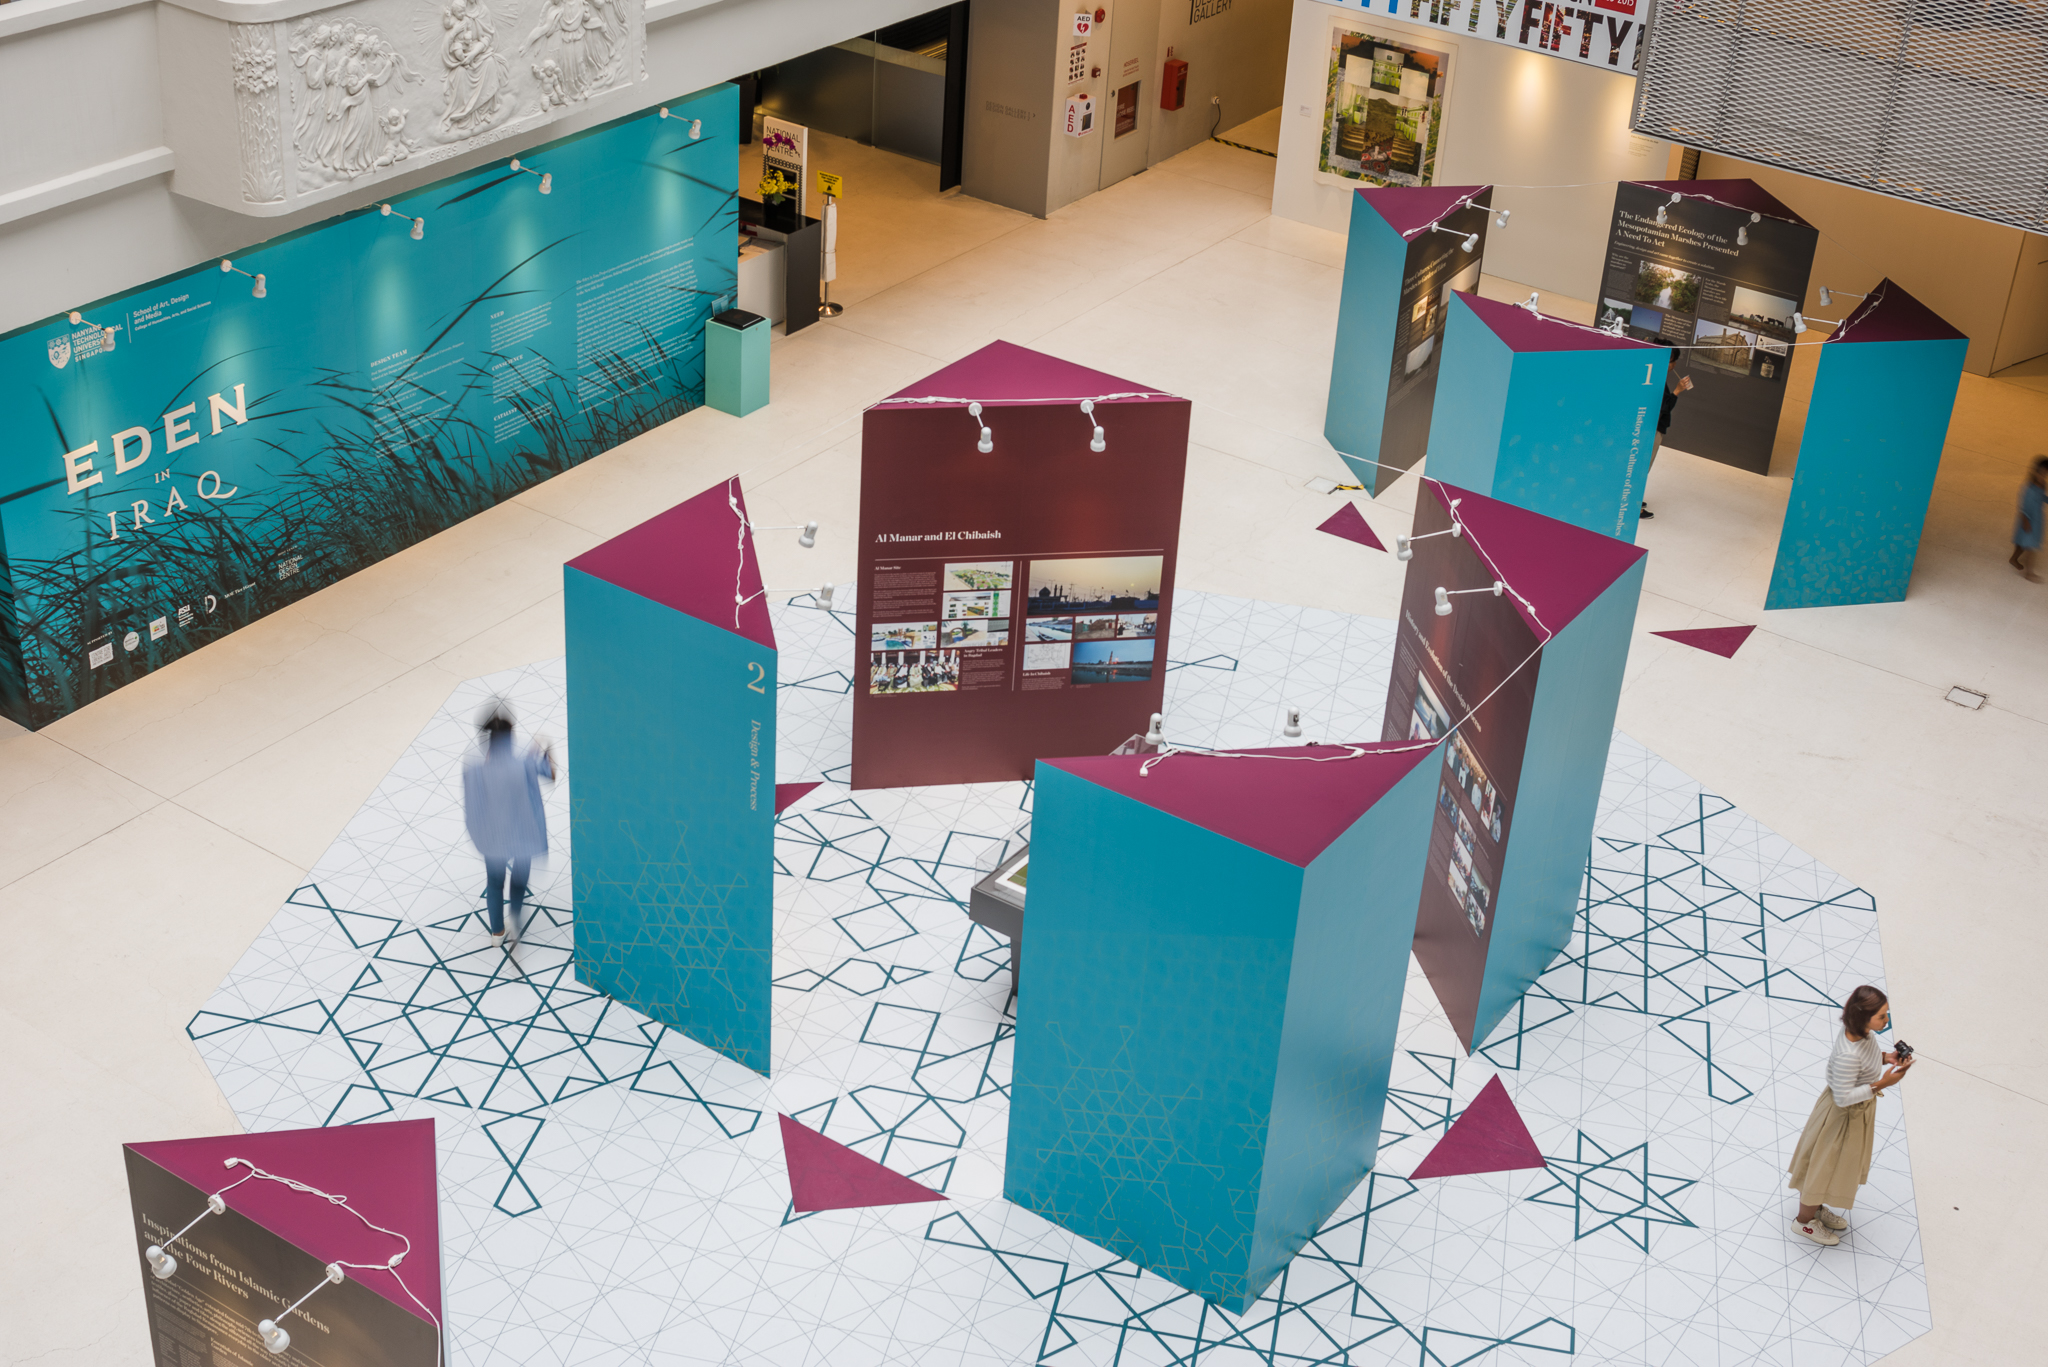 Eden In Iraq Exhibition, National Design Centre Singapore